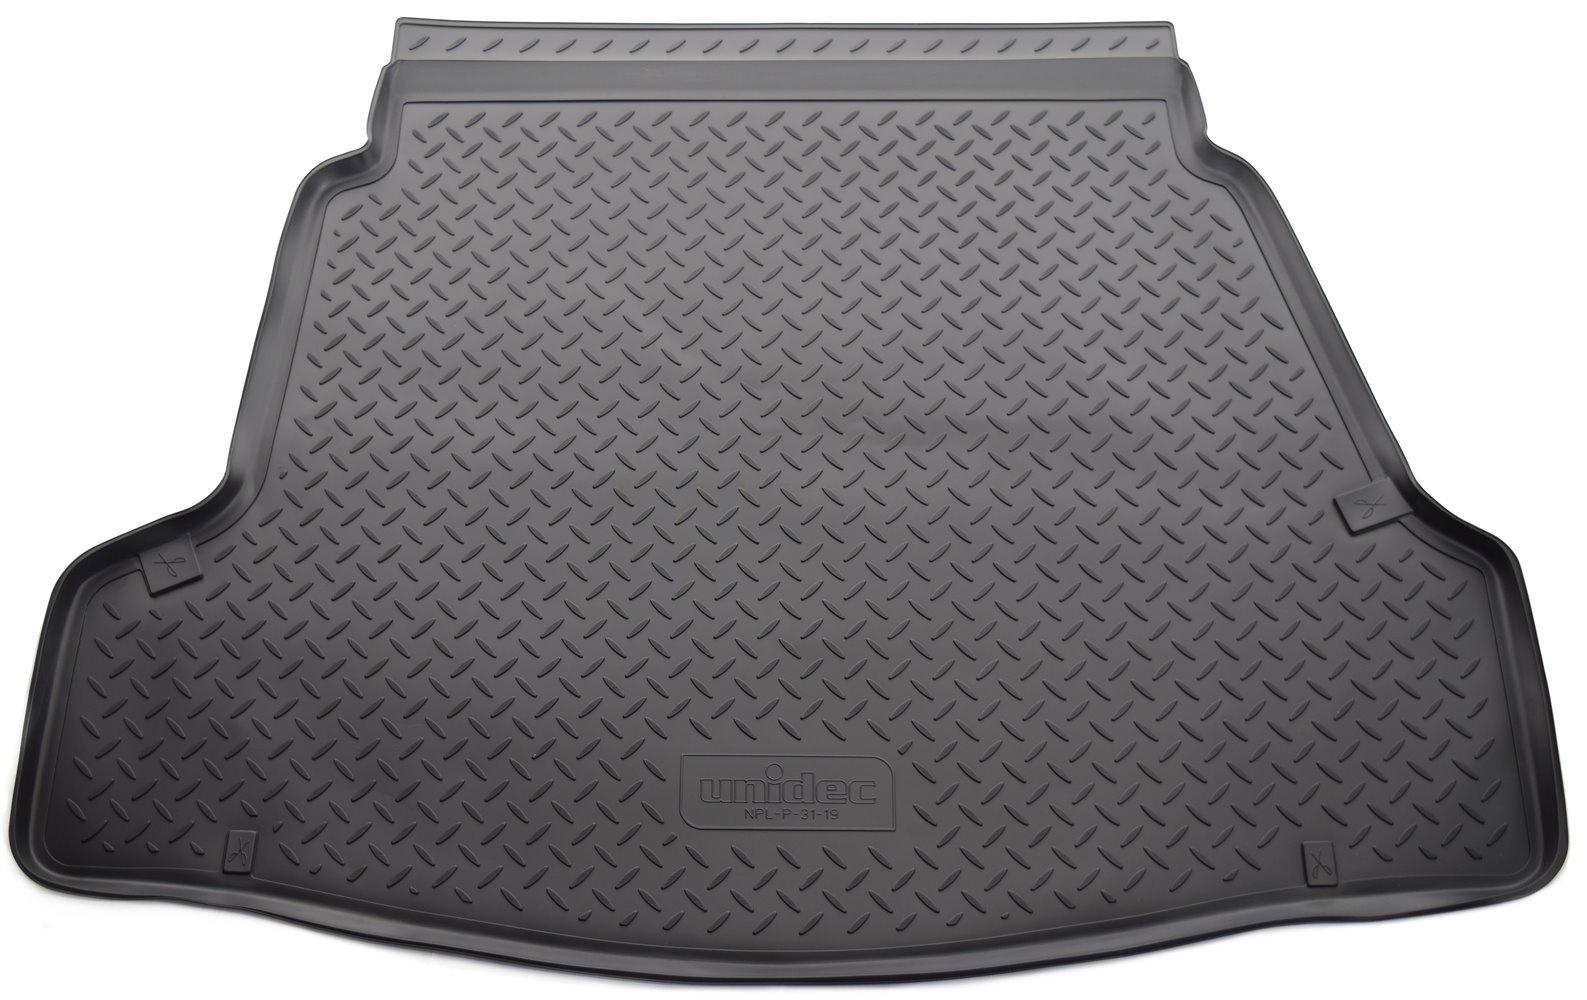 Коврик багажника Norplast для Hyundai i40 VF SD 2011, NPL-P-31-19, черный